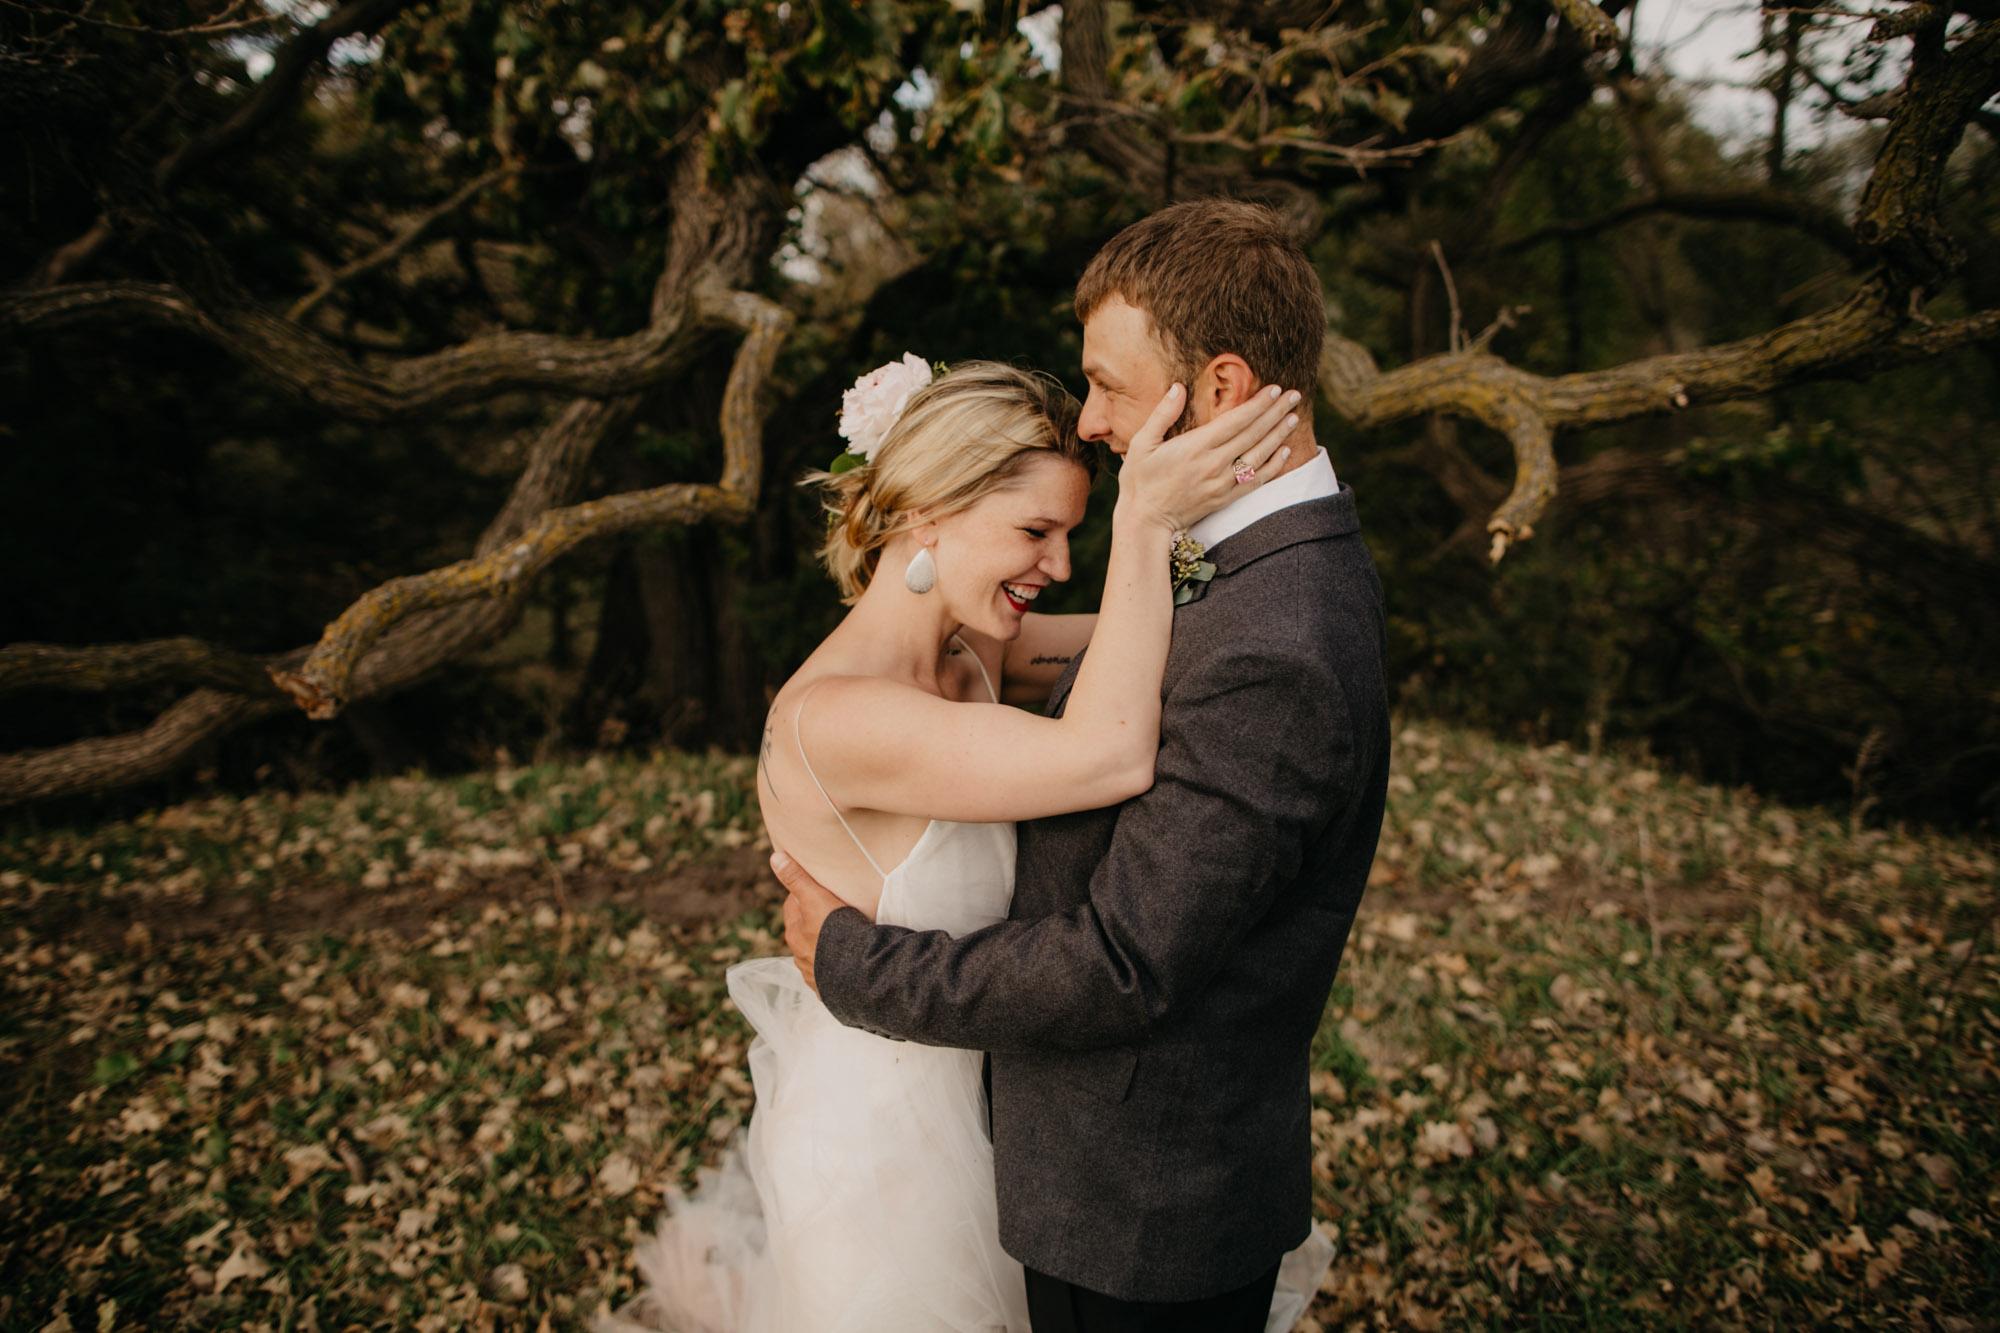 omaha-wedding-photographer-meghan-time-34.jpg